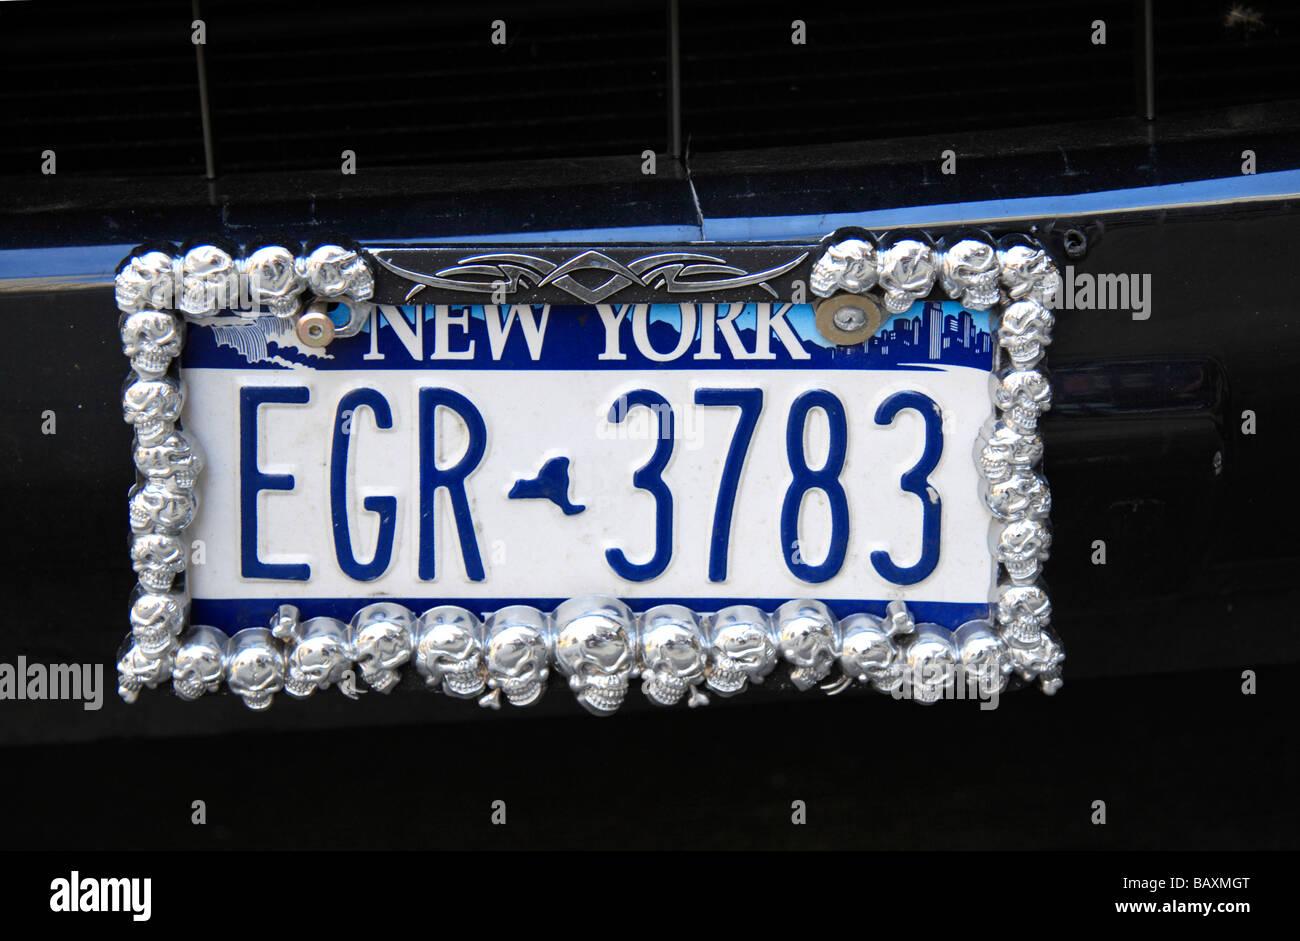 Car Number Plate Stockfotos & Car Number Plate Bilder - Alamy